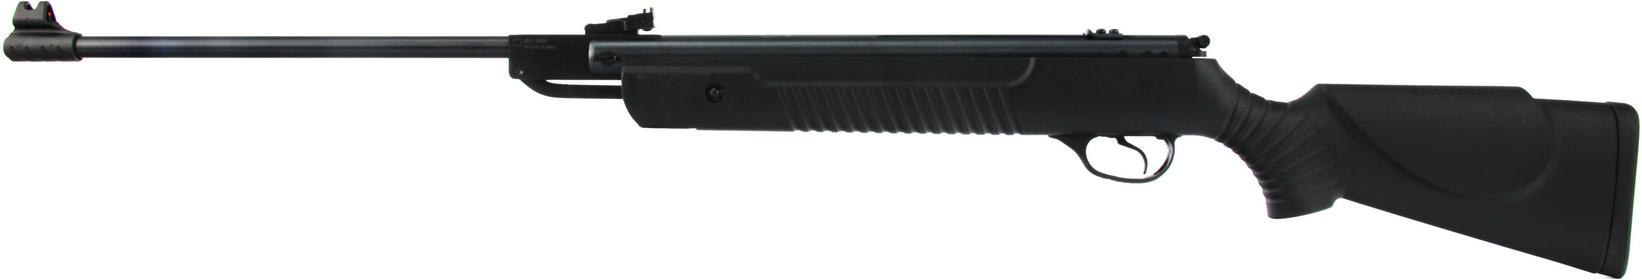 Hatsan Wiatrówka 80 STG SAS Quattro Trigger 4.5 mm 053-053